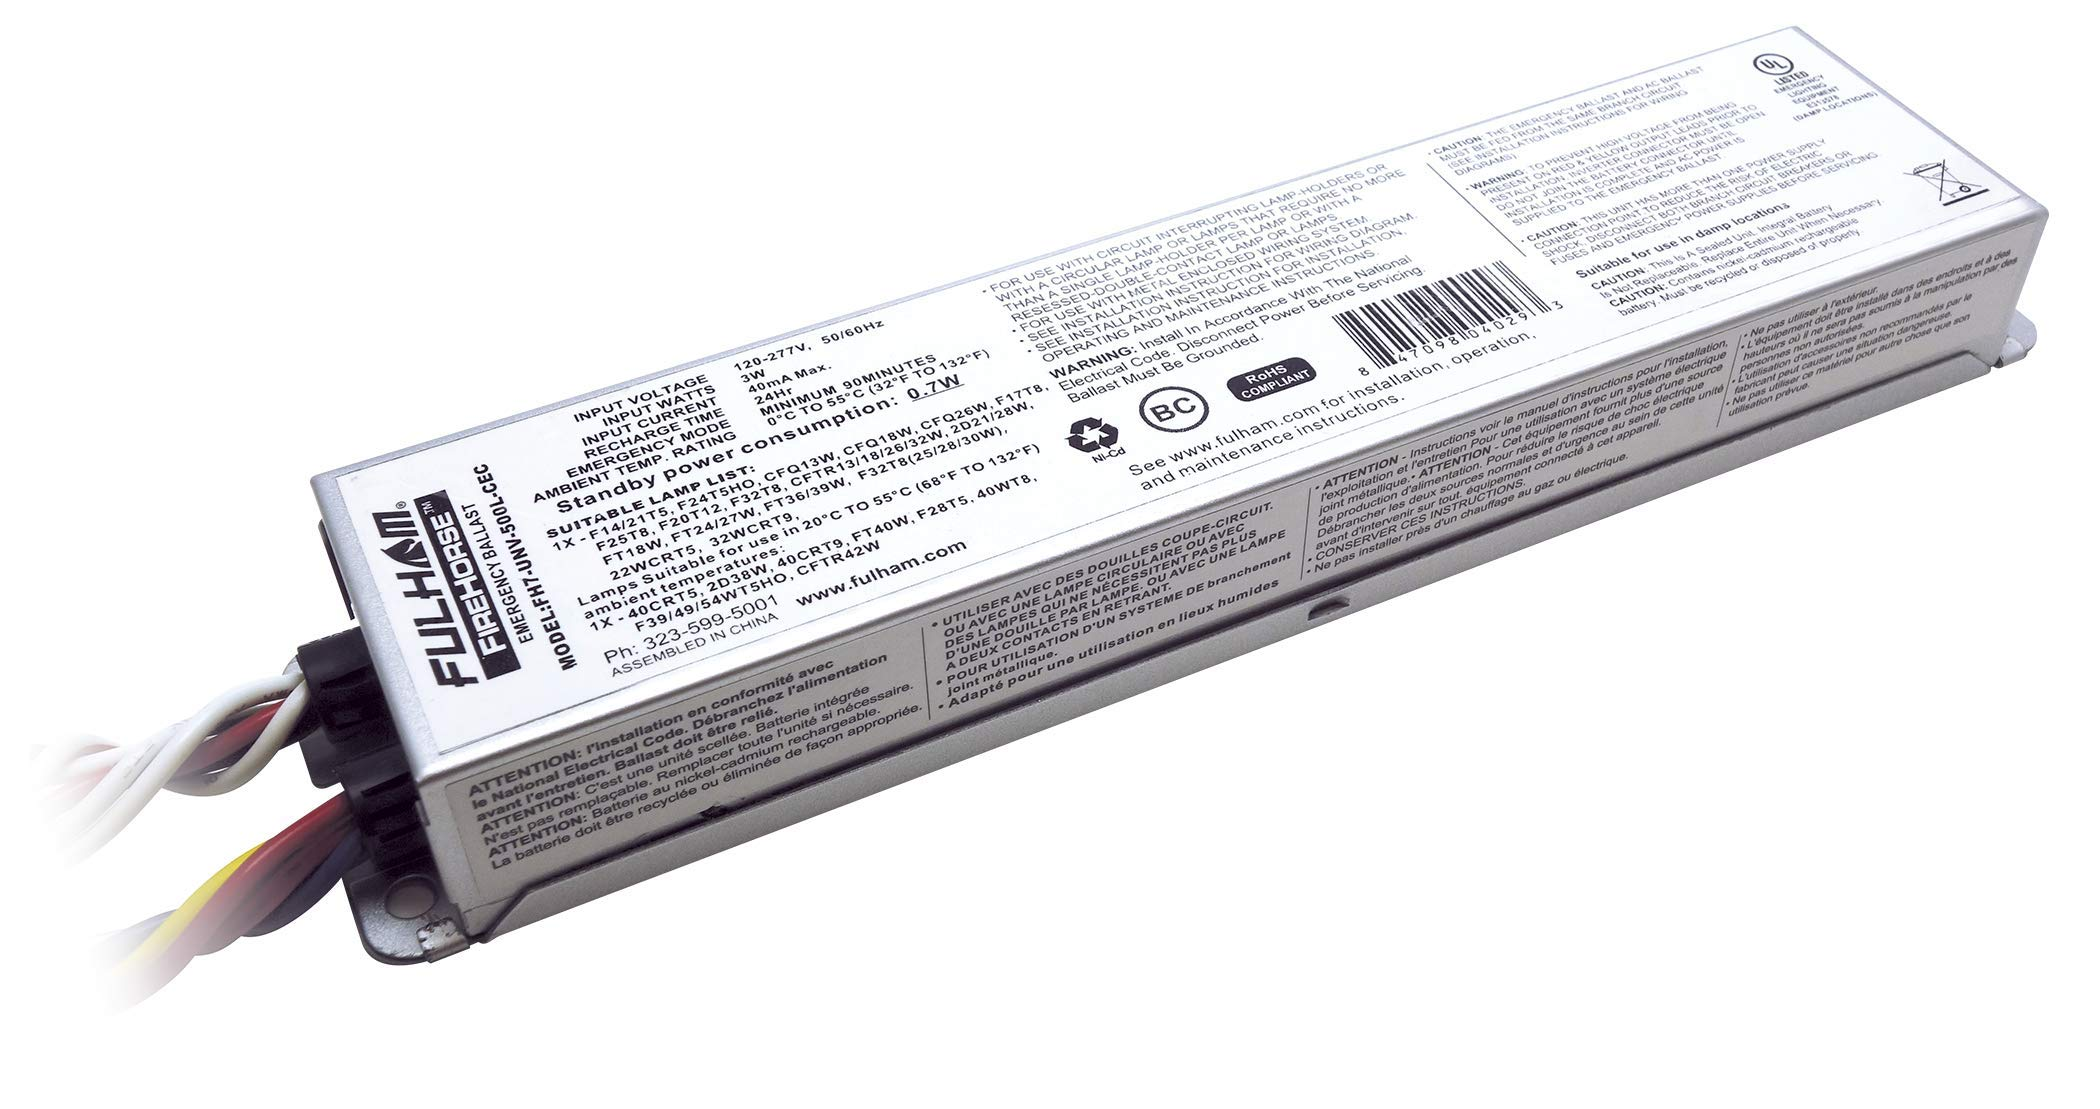 Fulham Lighting FH7-UNV-500L-CEC FireHorse 7-Emergency Ballast-Universal Voltage-500 Initial Lumen Output